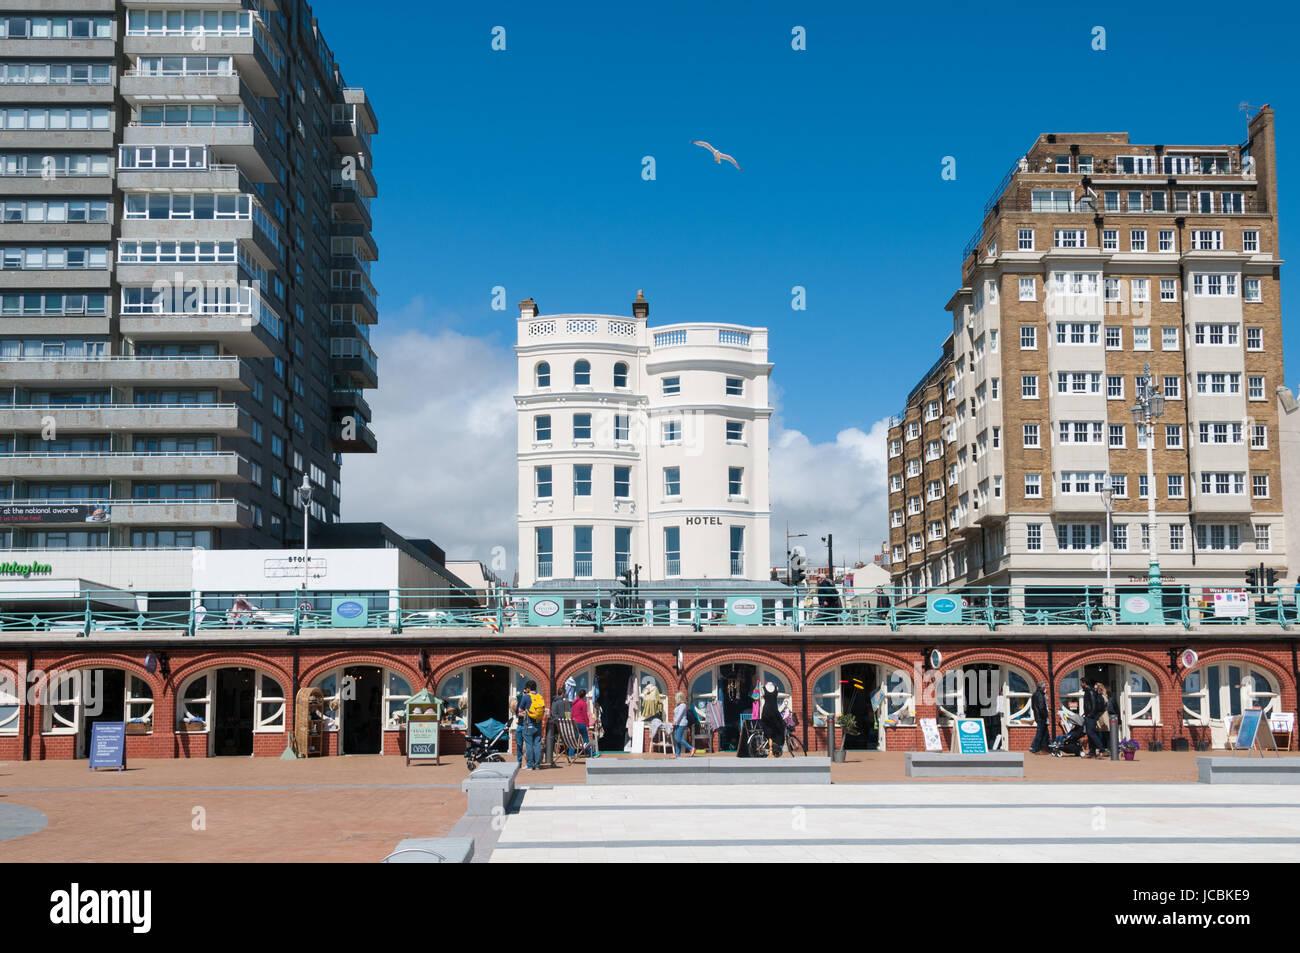 King's Road, arcos, Brighton Seafront, Reino Unido Imagen De Stock